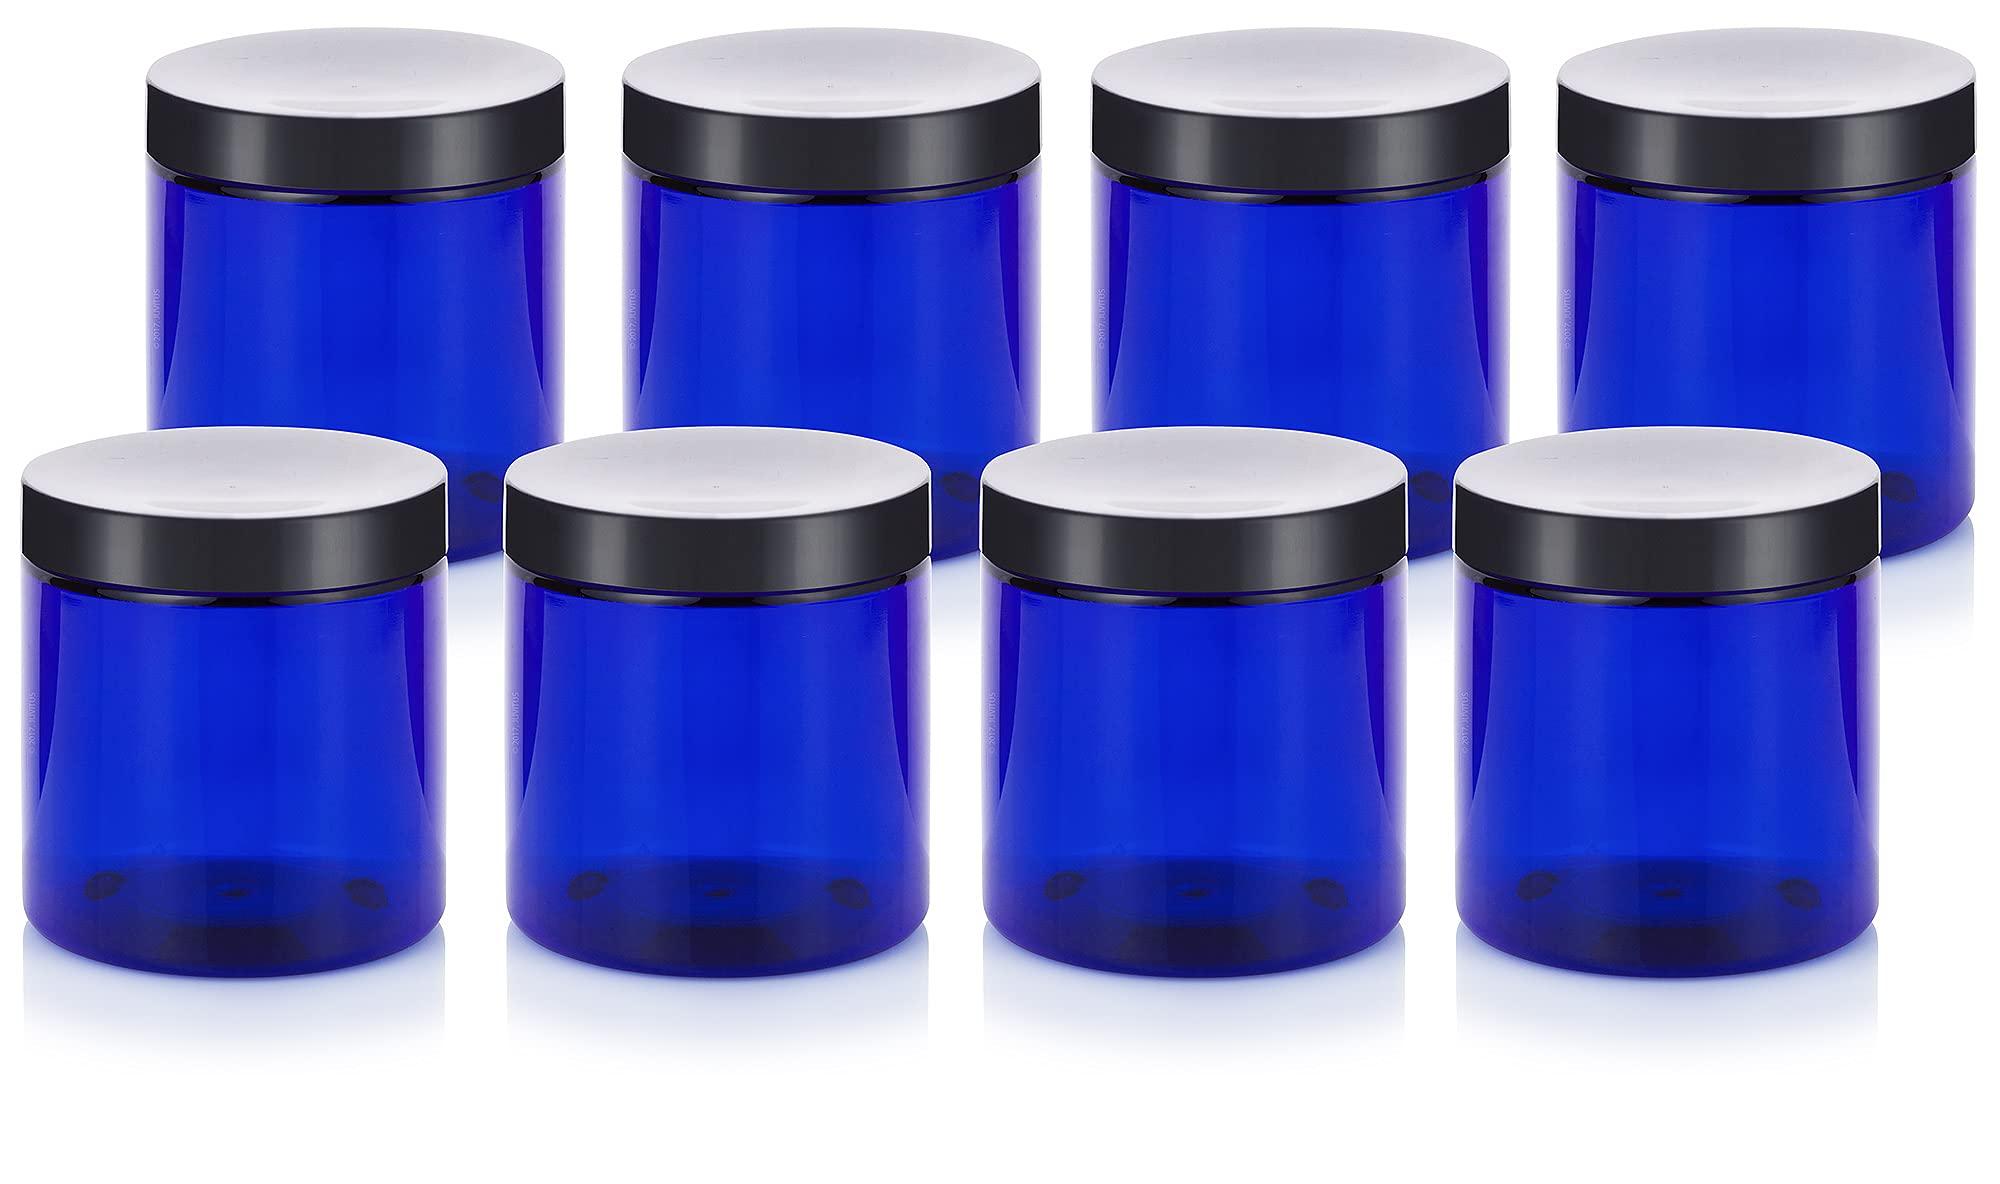 Cobalt Blue 8 oz / 250 ml PET (BPA Free) Plastic Jar (8 pack)